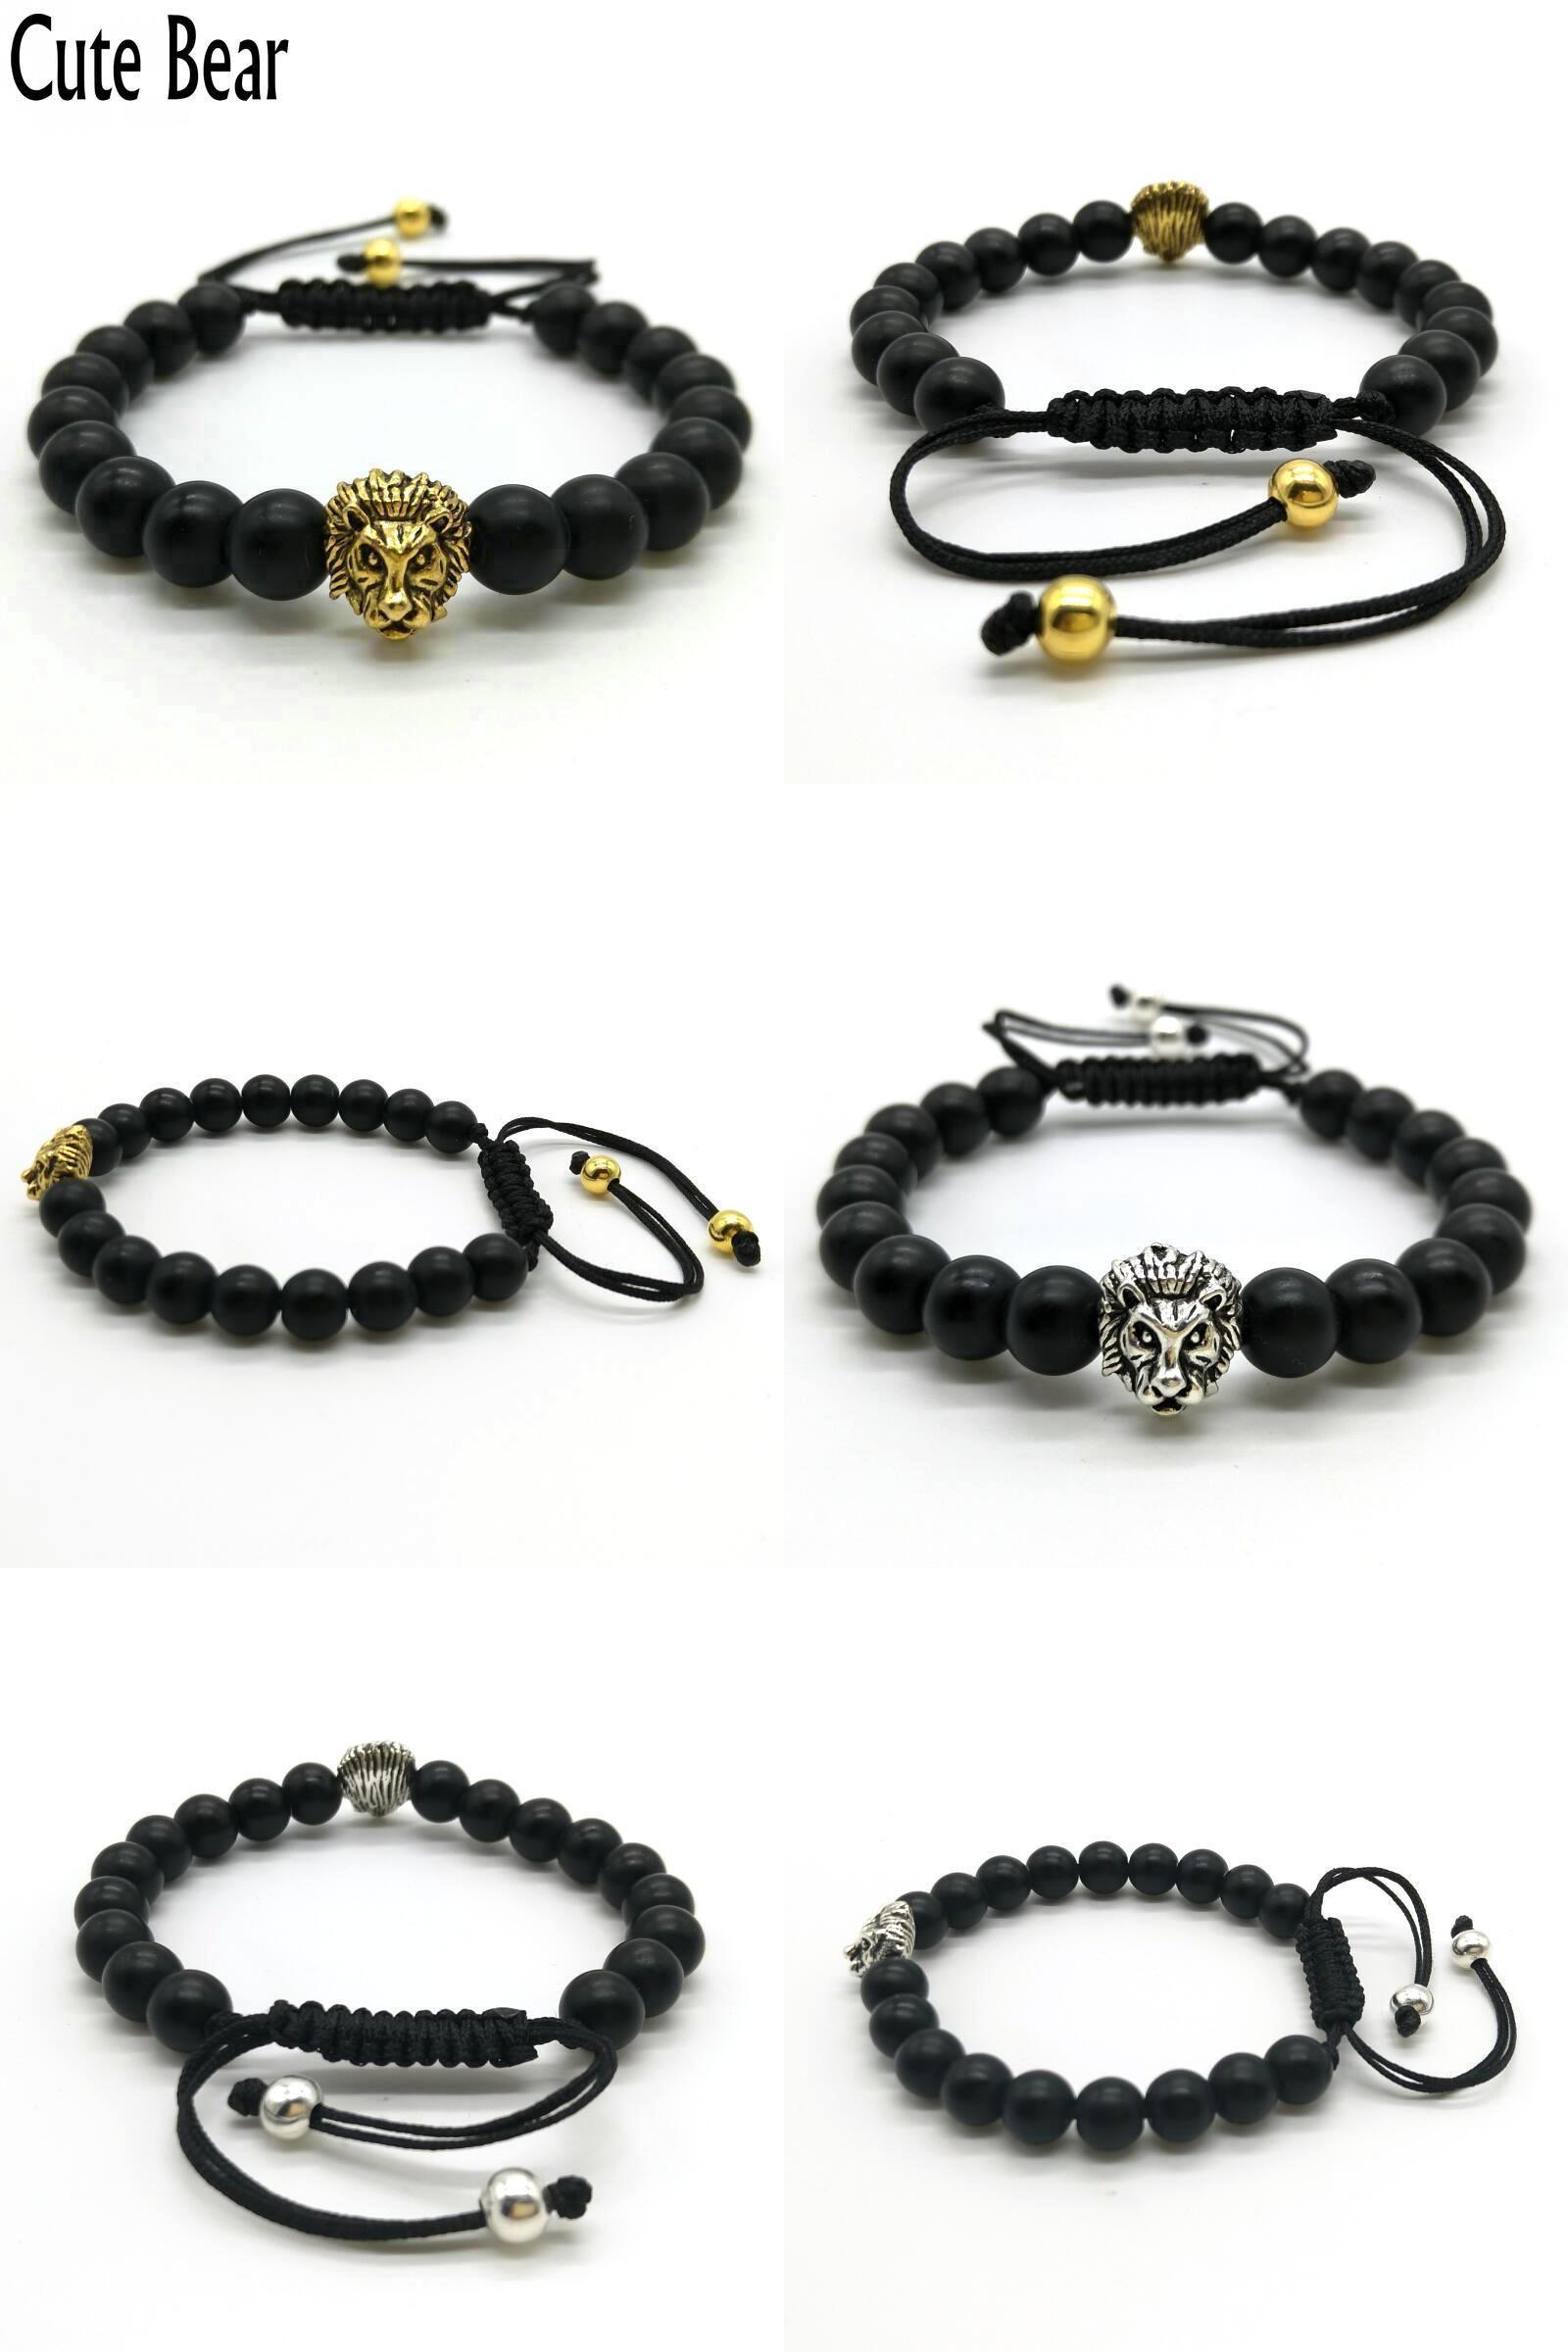 Visit to buy cute bear brand antique gold animal lion head bracelet